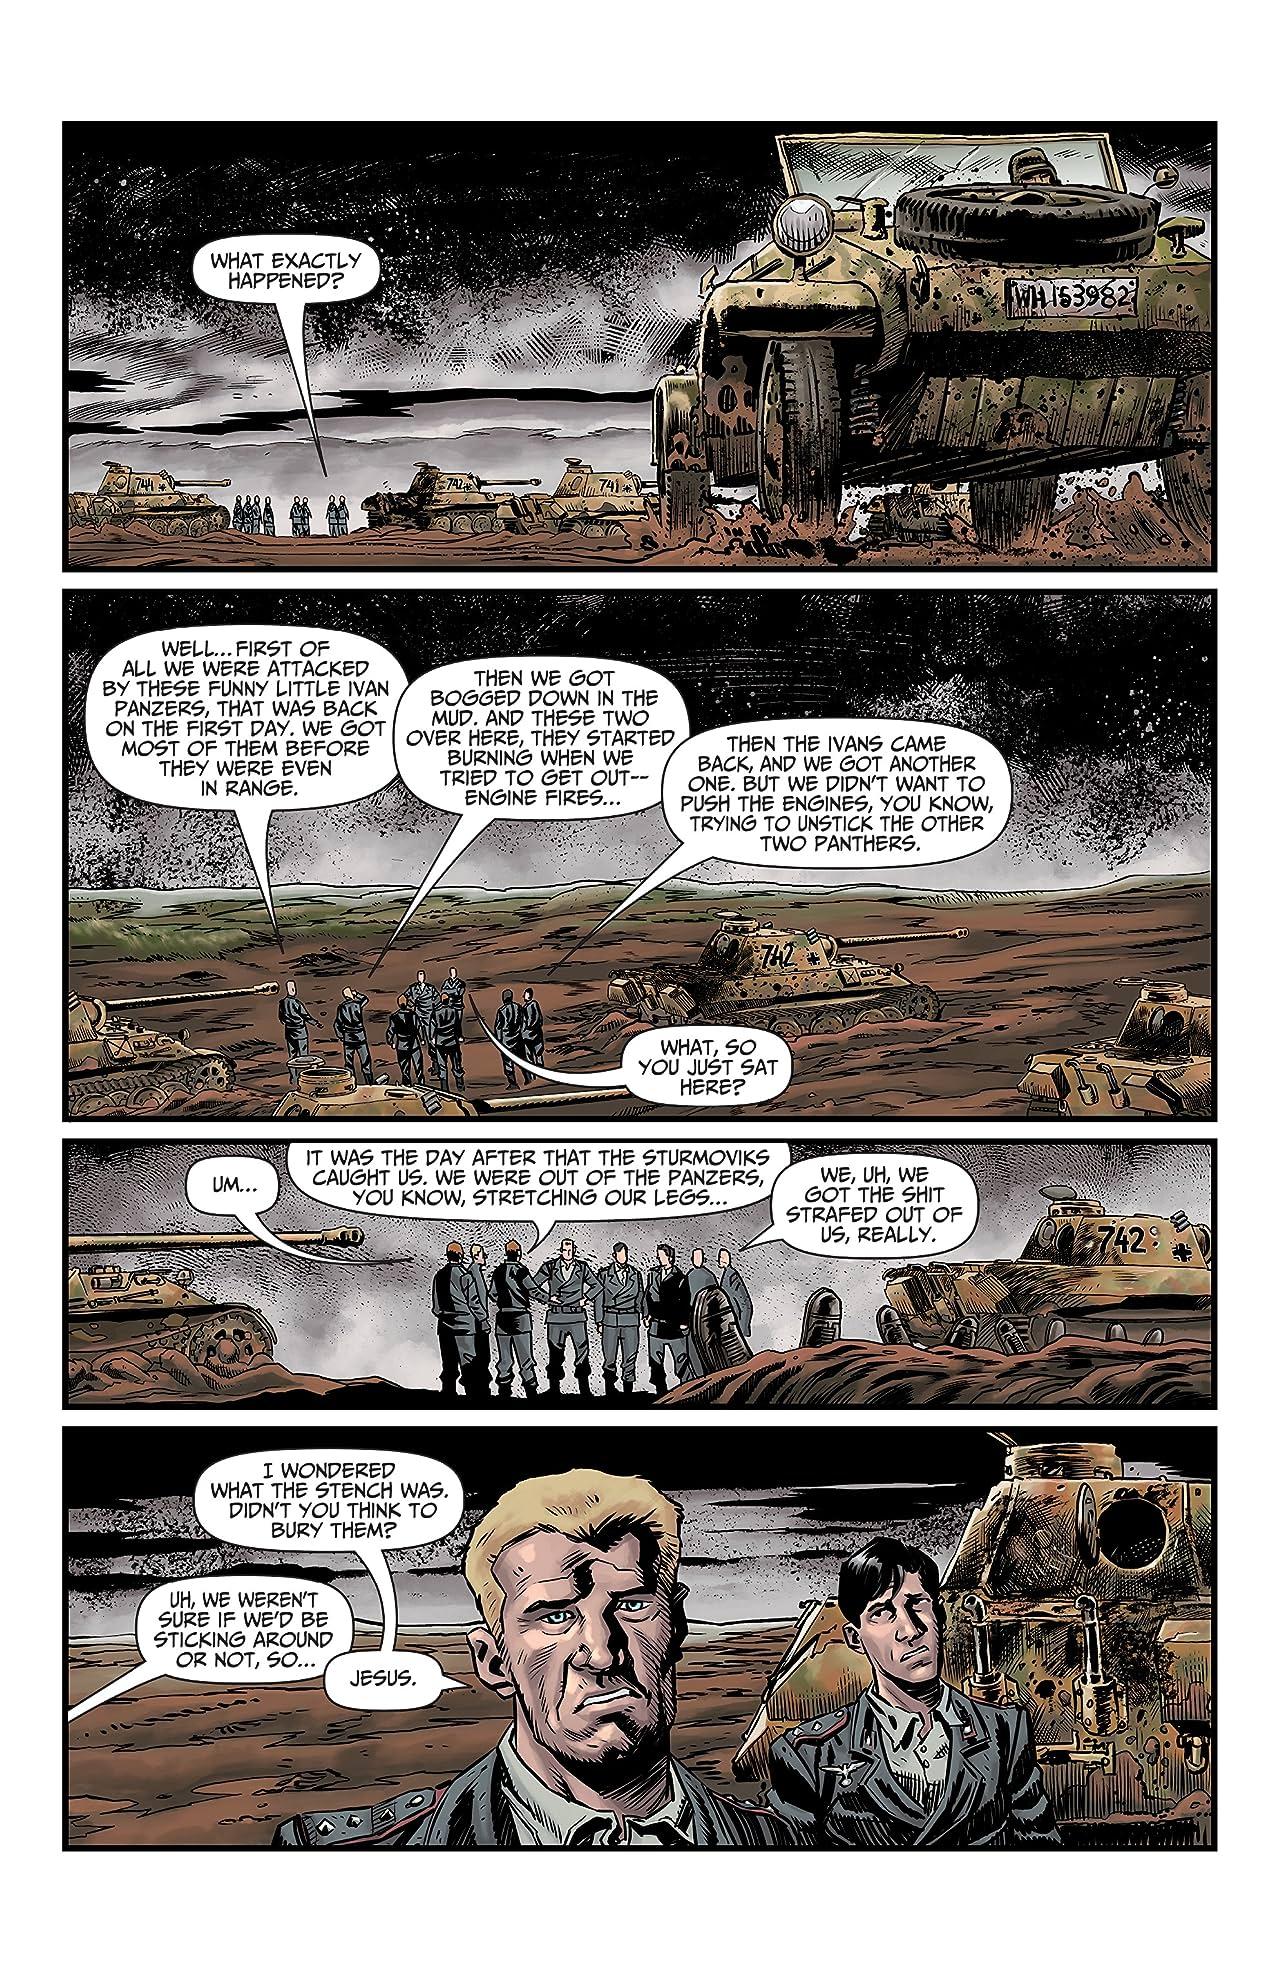 World of Tanks: Citadel #5